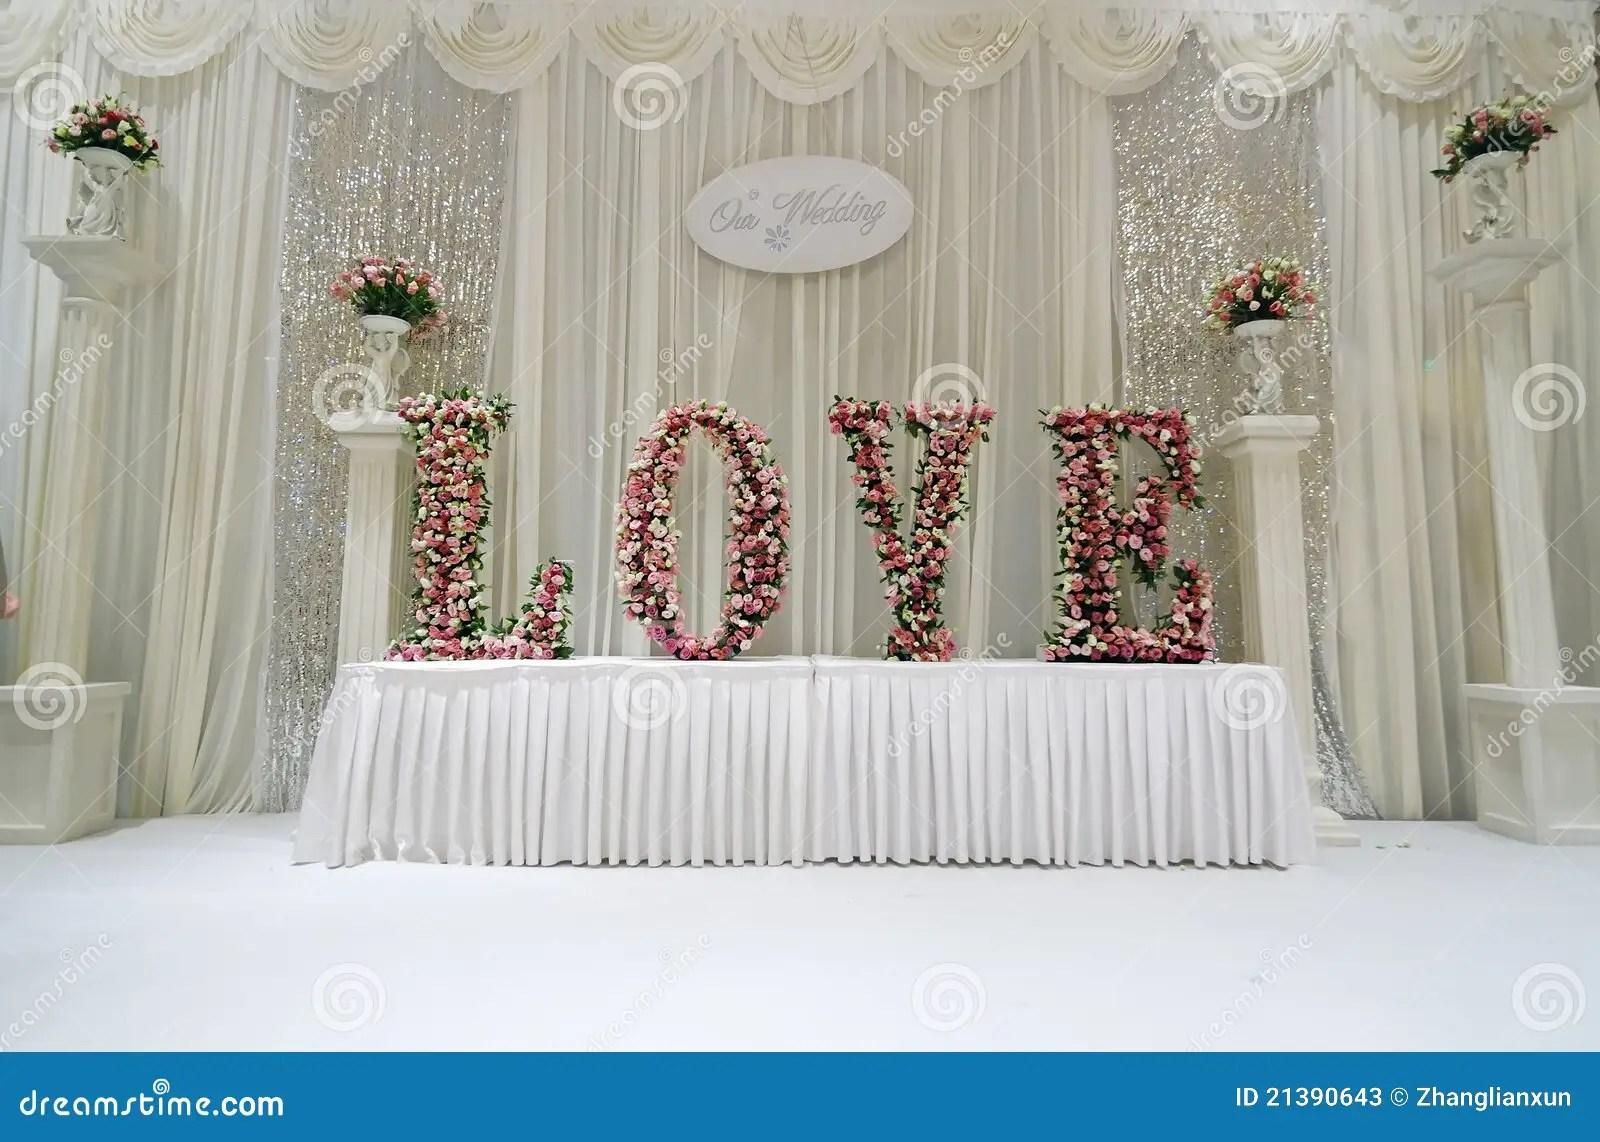 Wedding Stage Stock Photos  Image 21390643